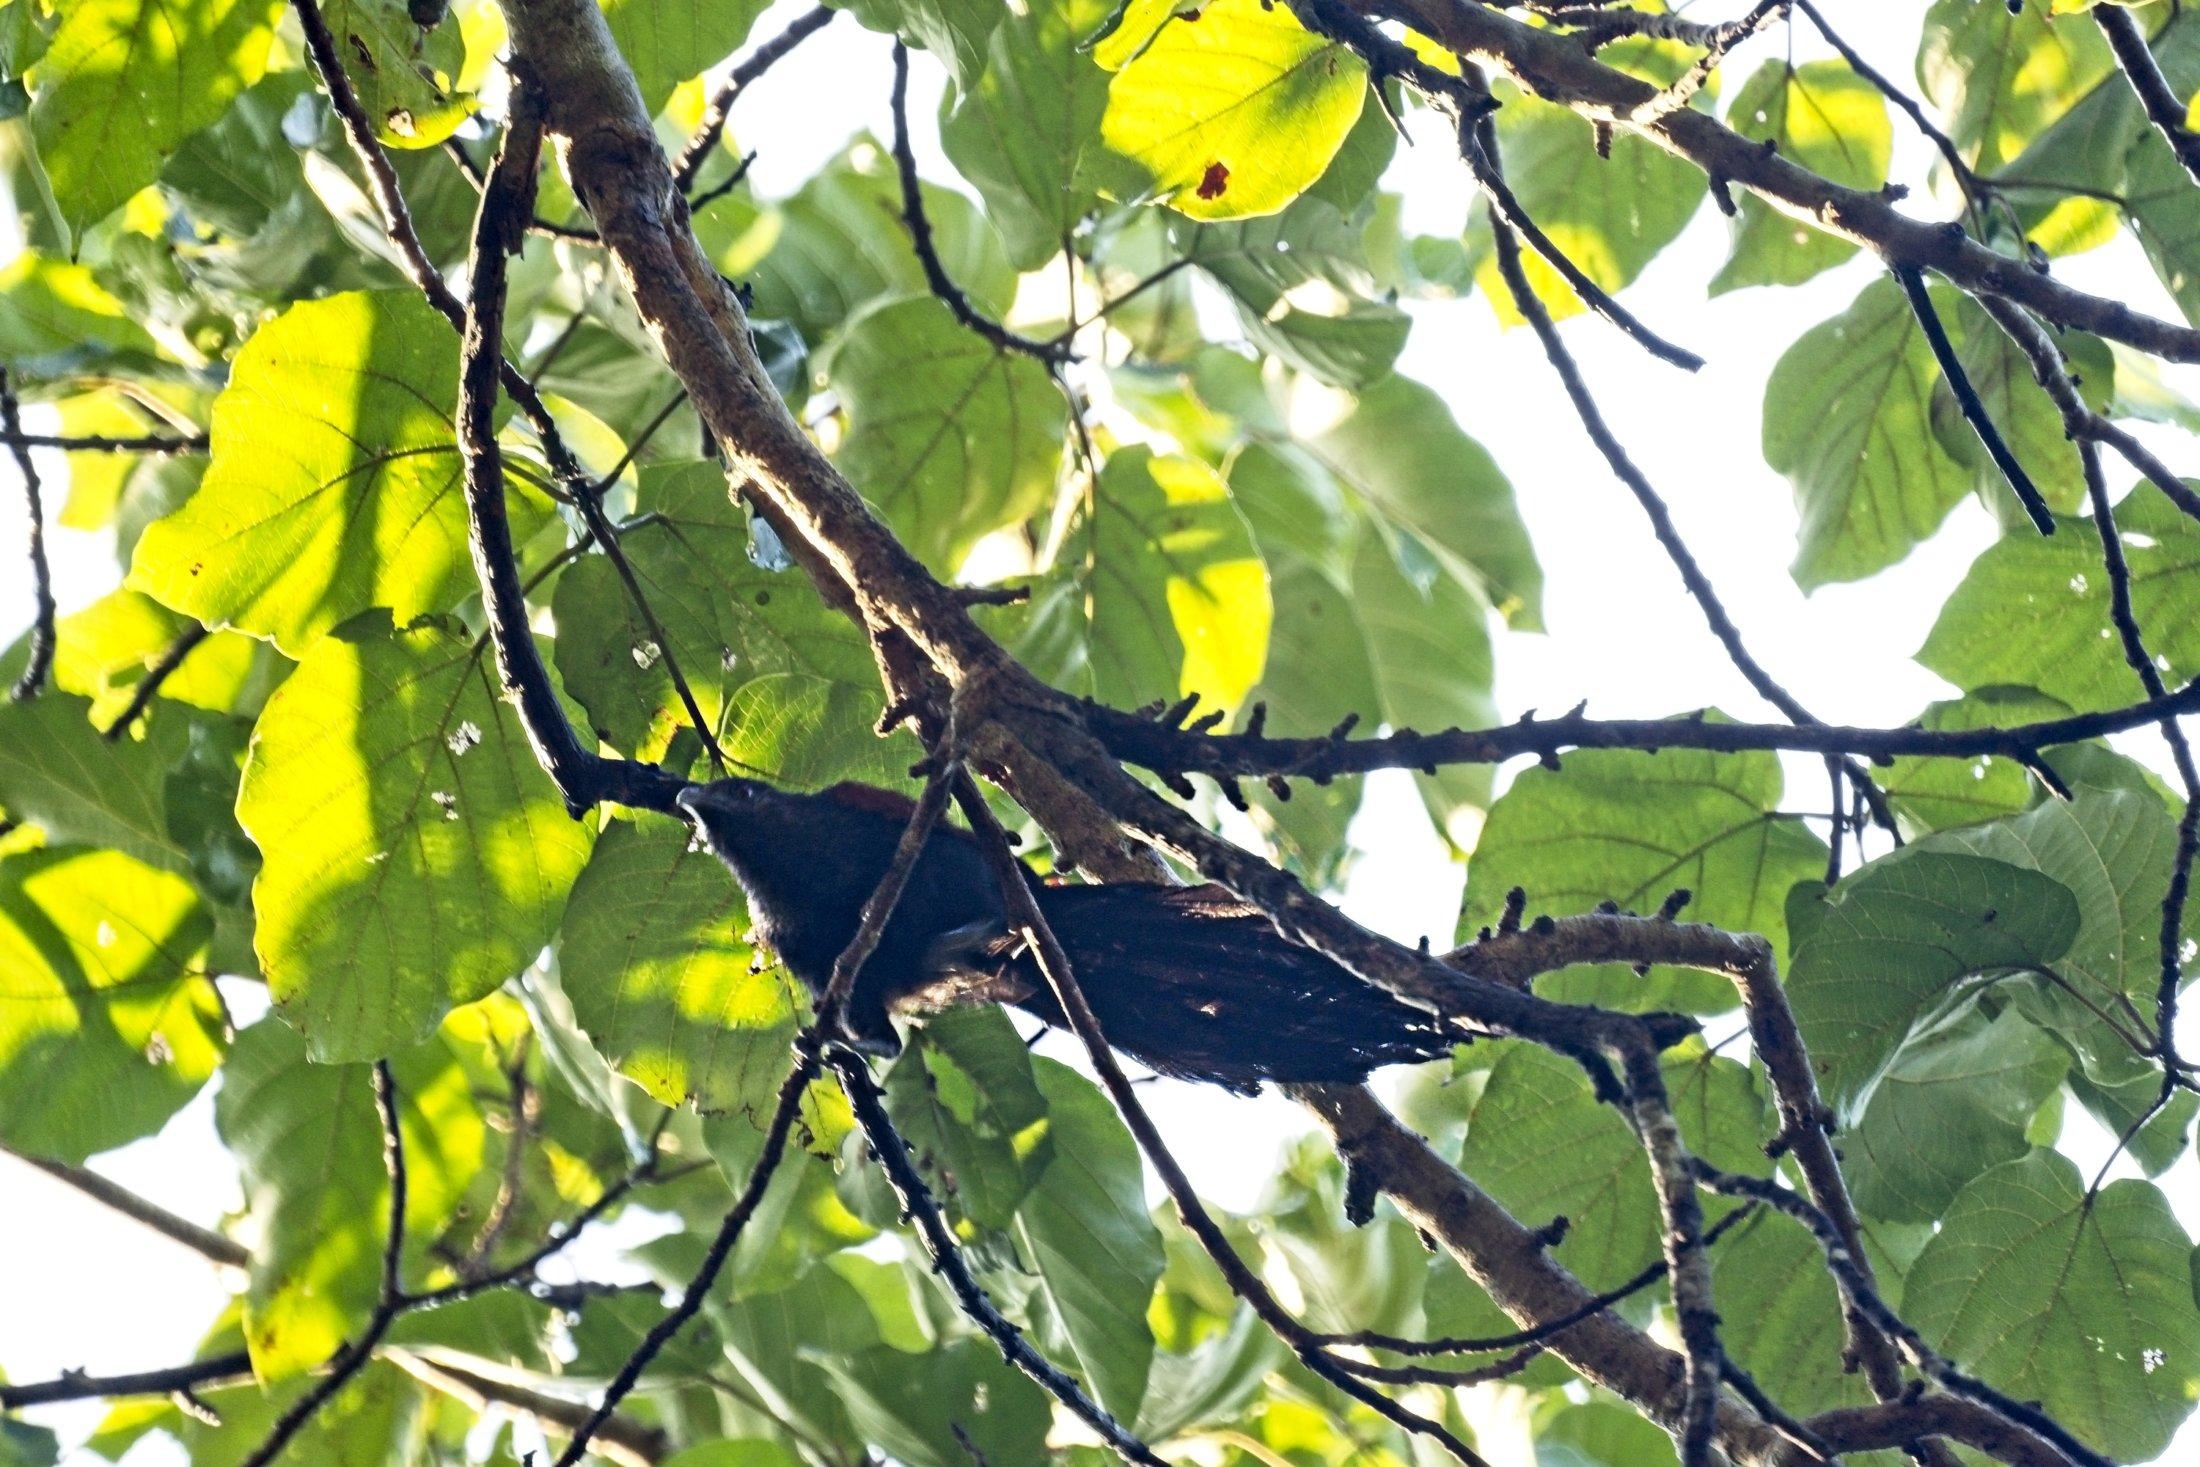 Philippine Coucal - Centropus viridis